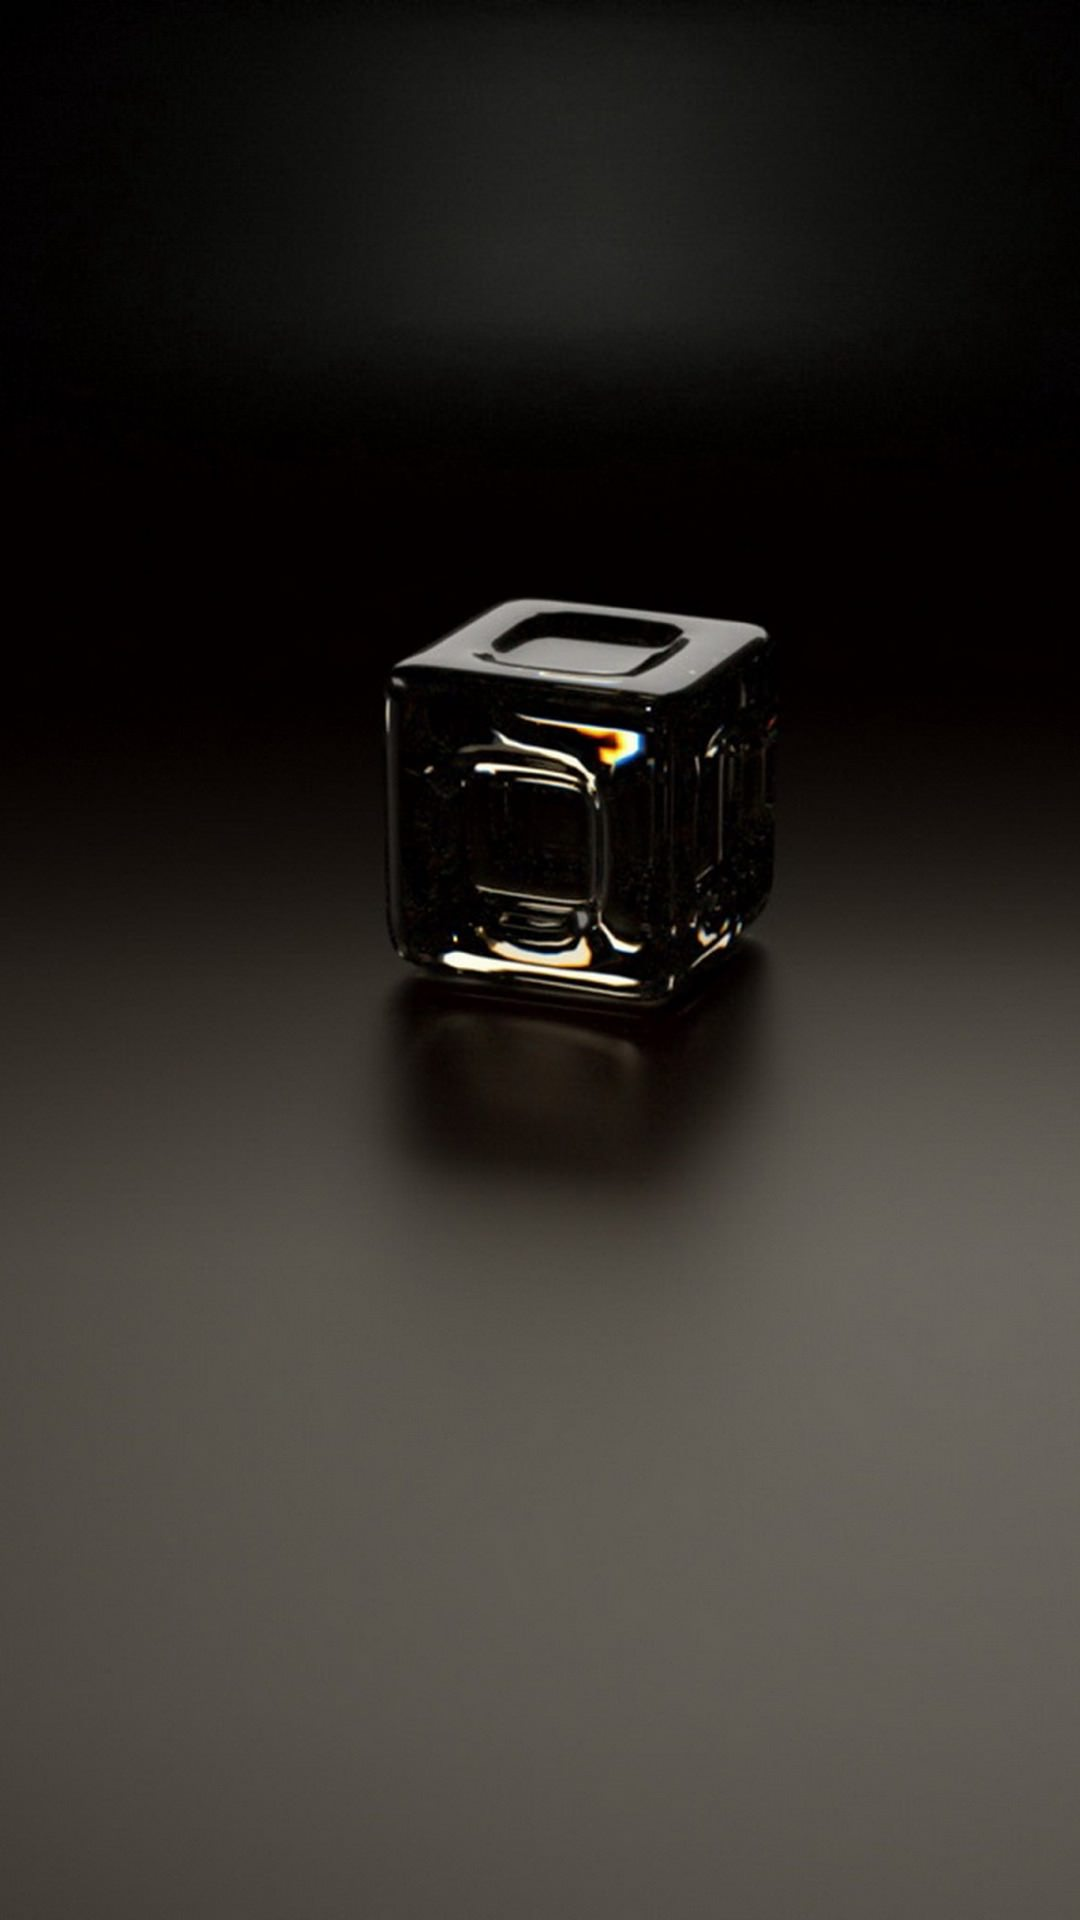 Cool Black Cube Wallpaper Sc Smartphone